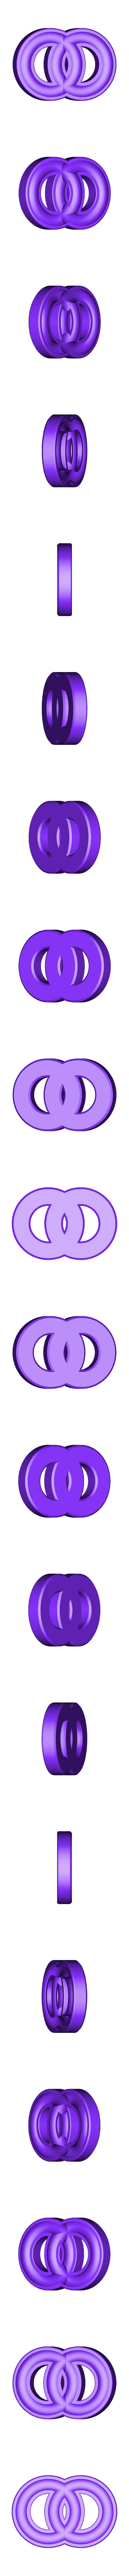 MarbleRingFree_16mm.stl Download free STL file Smiley Face Marble Rings, Hungarian Rings, Marble Fun • 3D printable design, LGBU